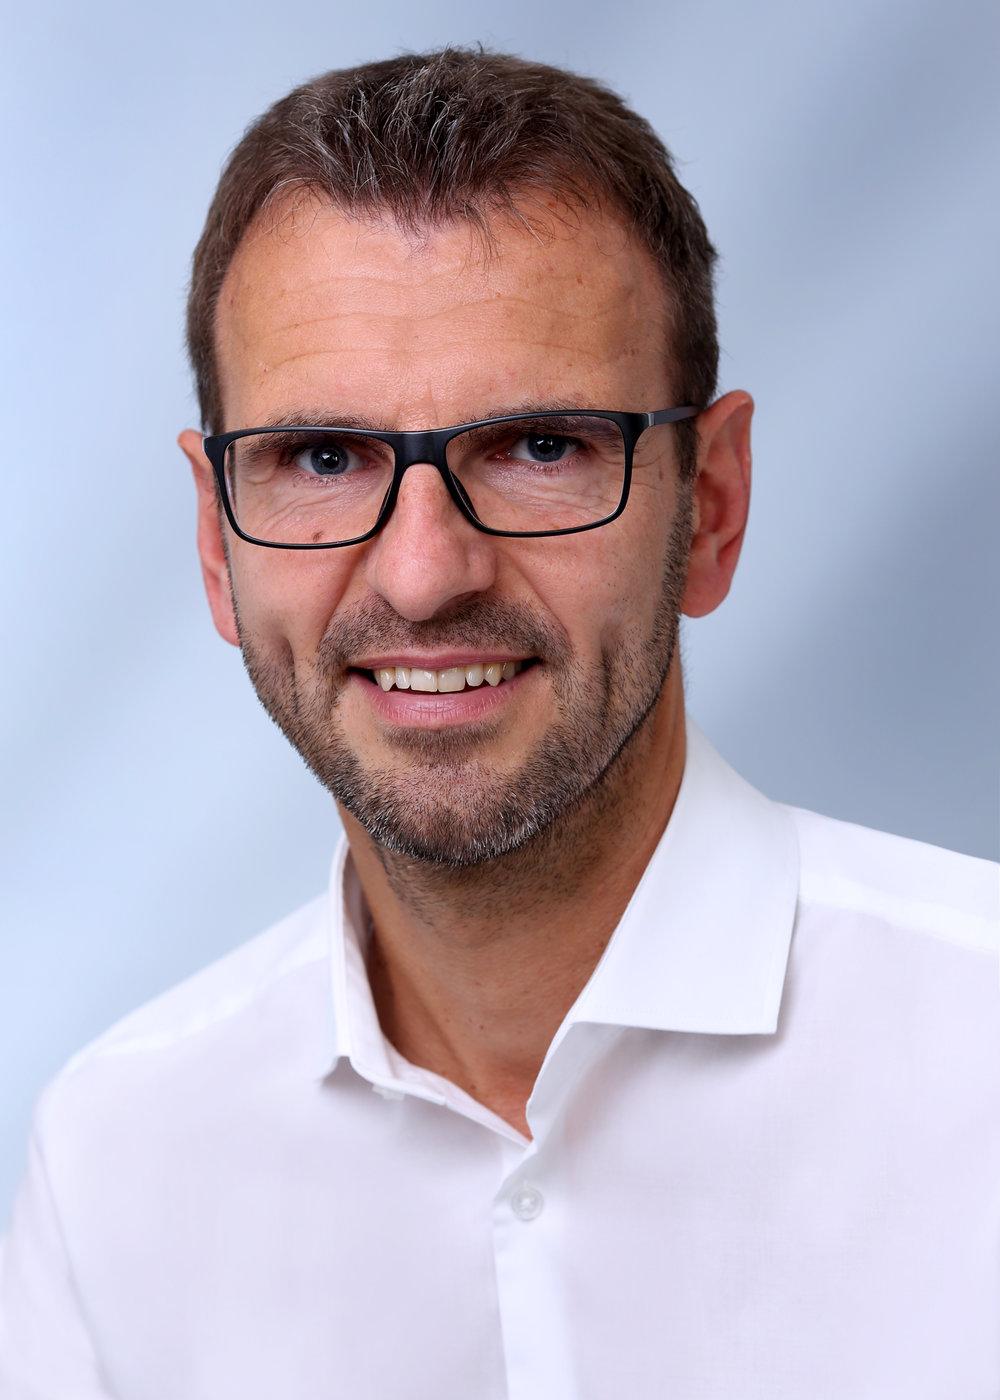 Mario Pieper, BSH Hausgeräte GmbH